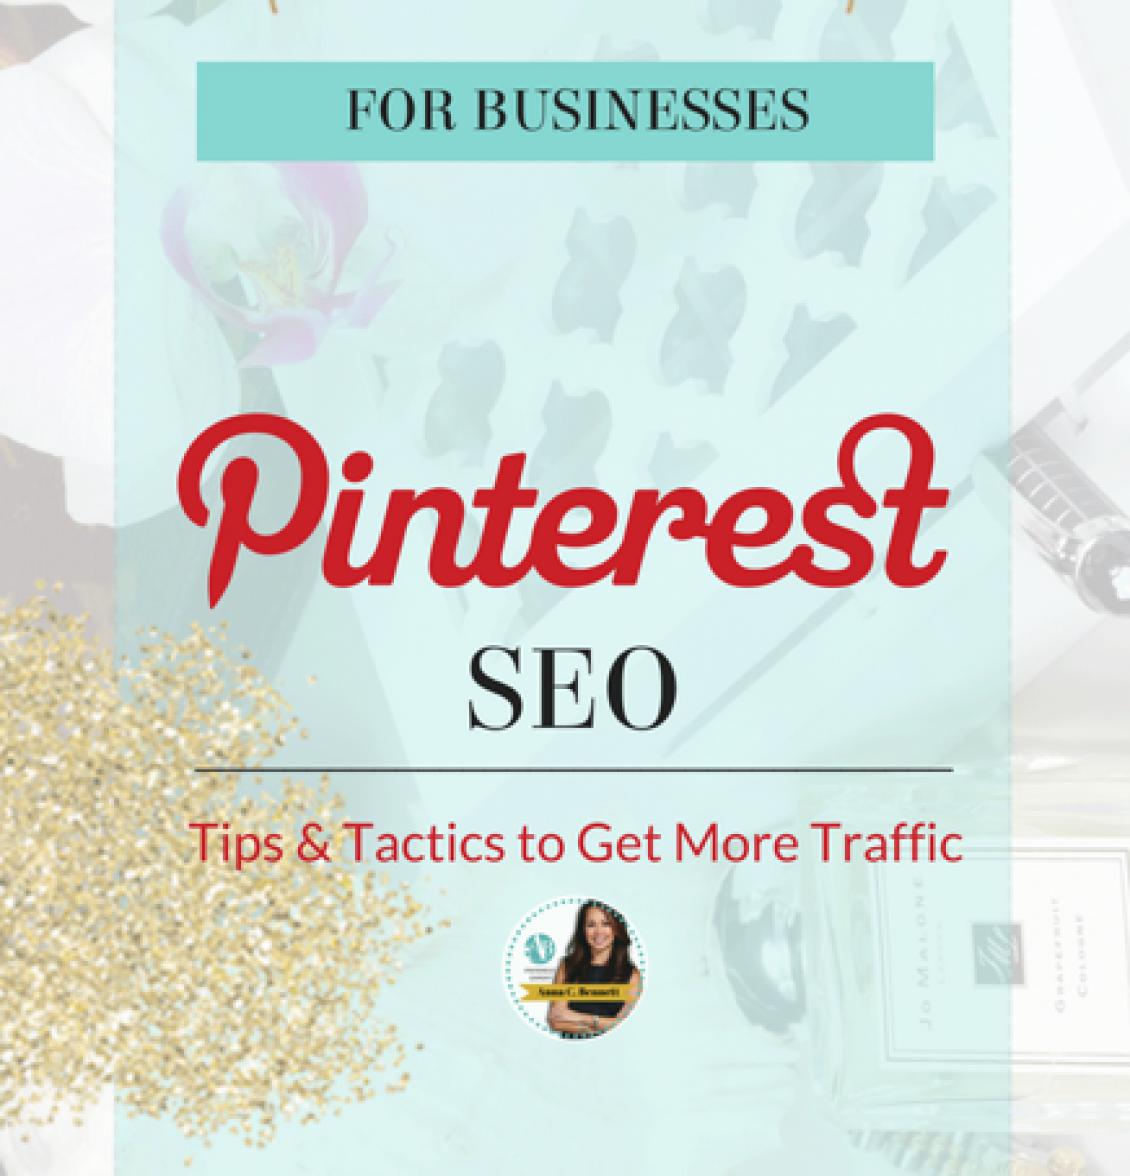 Pinterest SEO Tips & Tactics to Get More Traffic